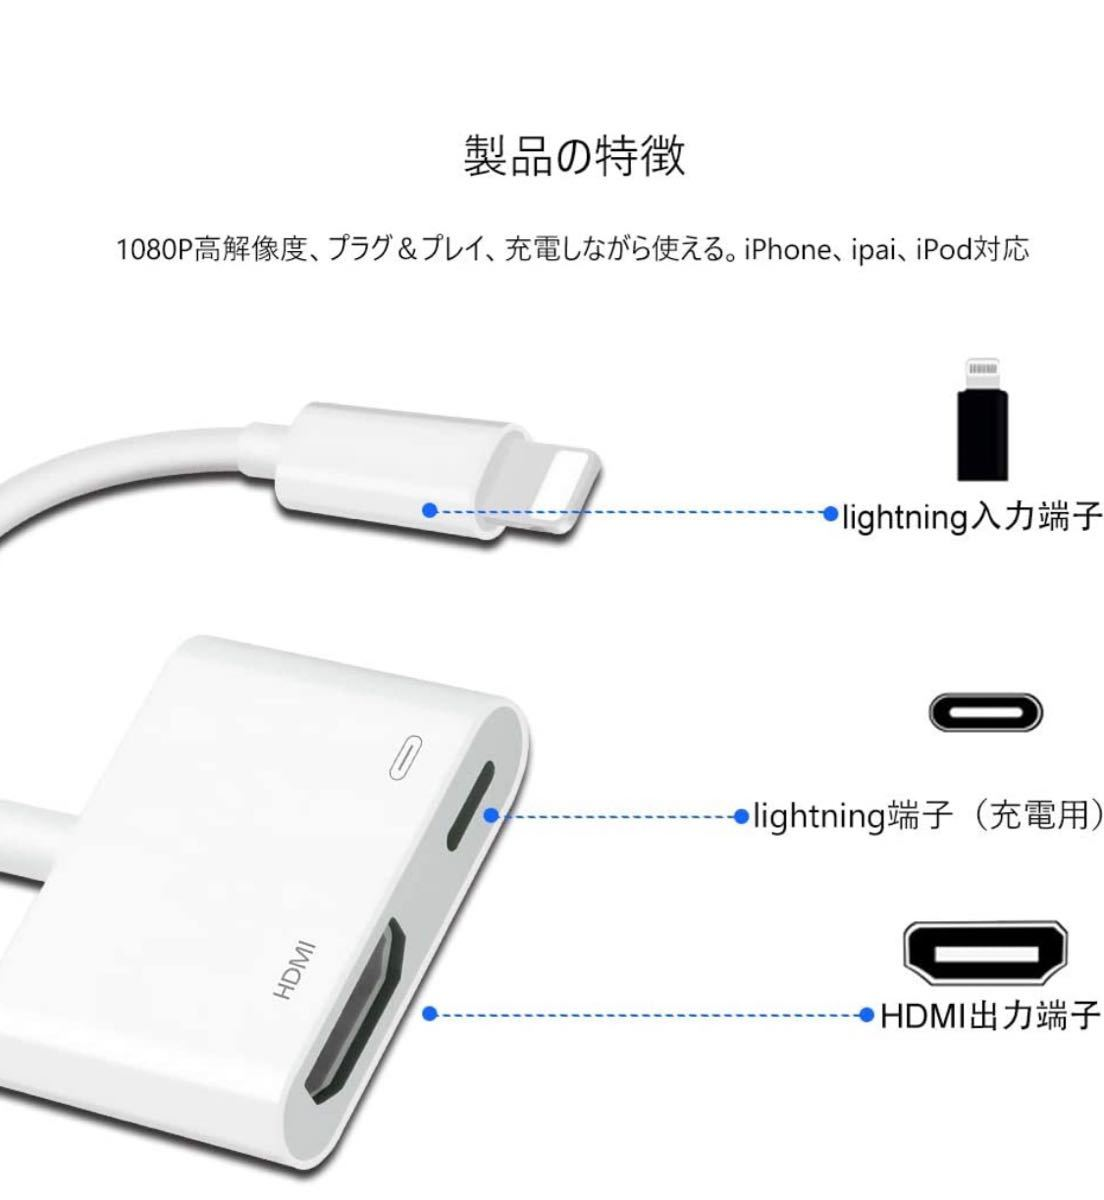 HDMI変換ケーブル HDMI変換アダプタ iPhone iPad